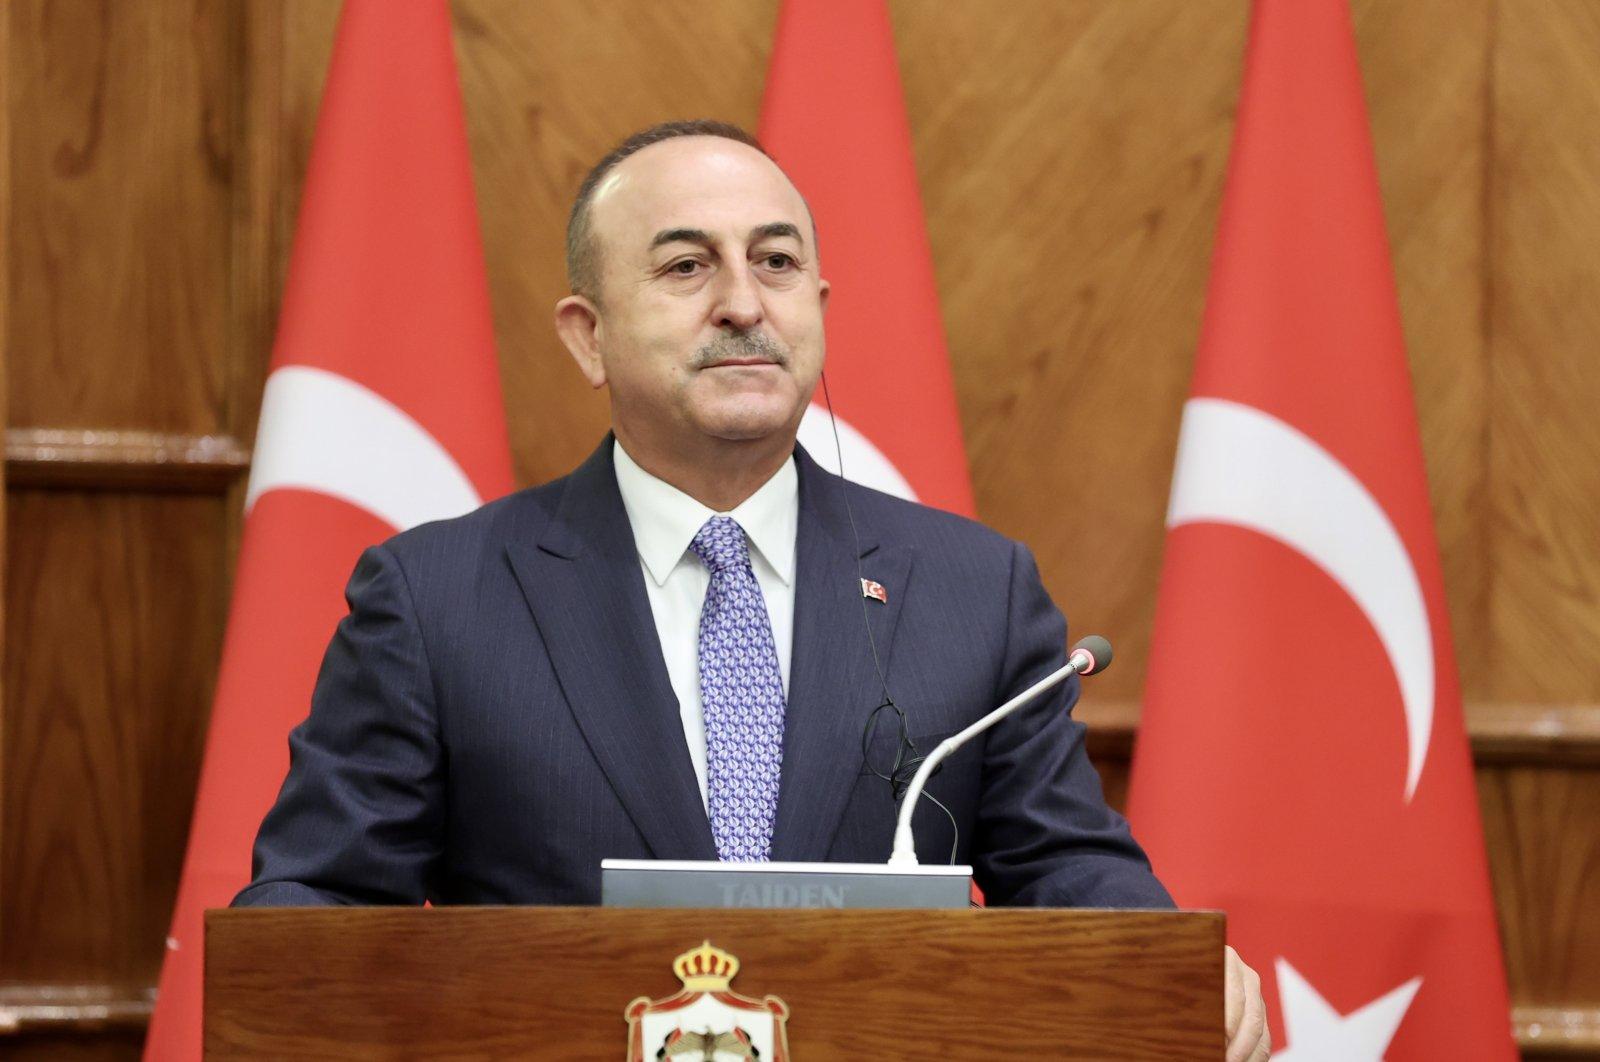 Foreign Minister Mevlüt Çavuşoğlu speaks at a joint news conference with Jordanian counterpart Ayman al-Safadi, Aug. 17, 2021. (AA Photo)